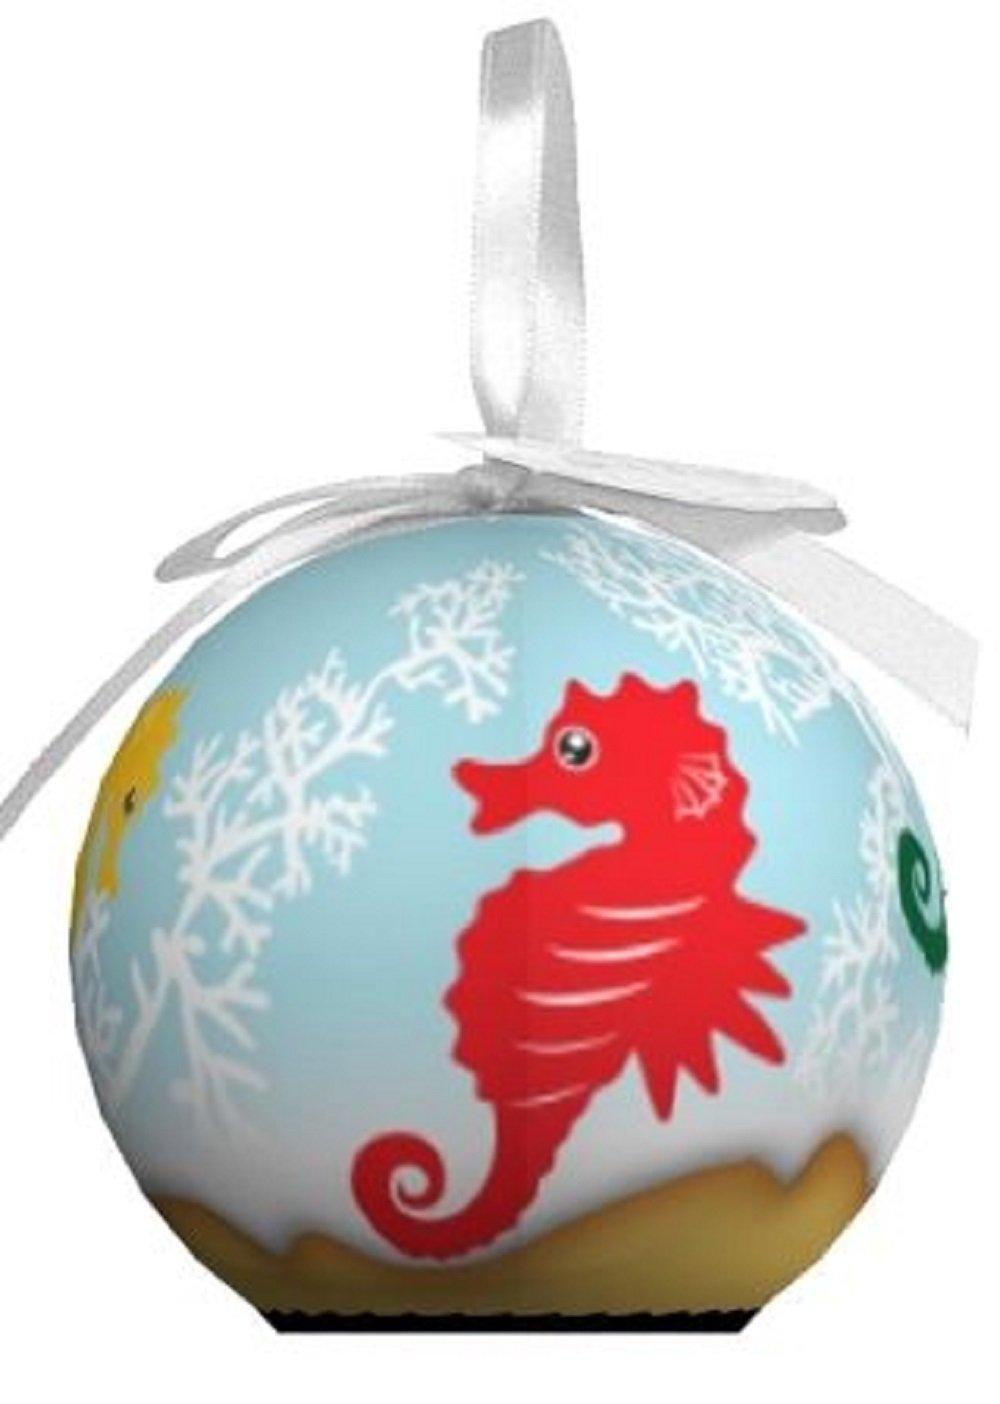 RETERMIT 10 pcs Sublimation Ceramic Ornament Christmas Tree